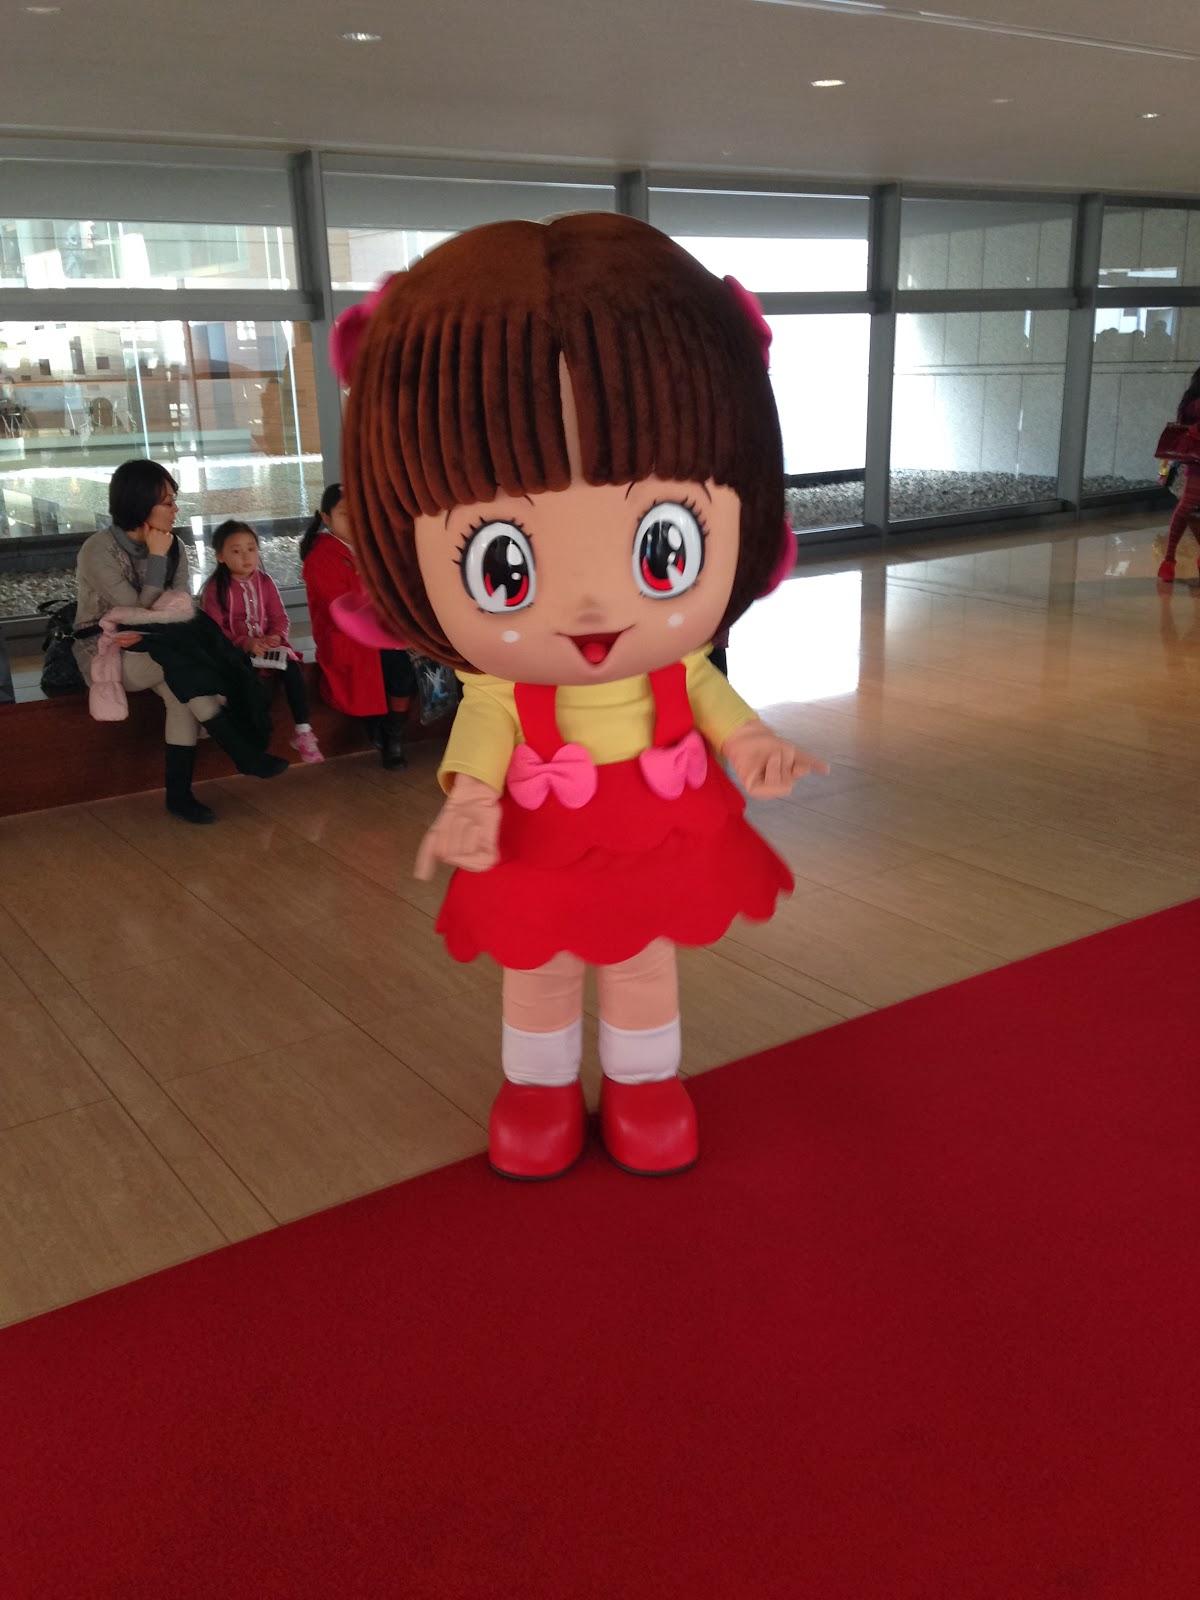 "<a href=""http://vionm.com/"">Thailand</a> <a href=""http://vionm.com/things-to-do-in-bangkok-thailand/thailandhoneymoon-explore-the-beauty-of-koh-samui/"">Beach</a>: Novel National Ballet Of Tokyo"